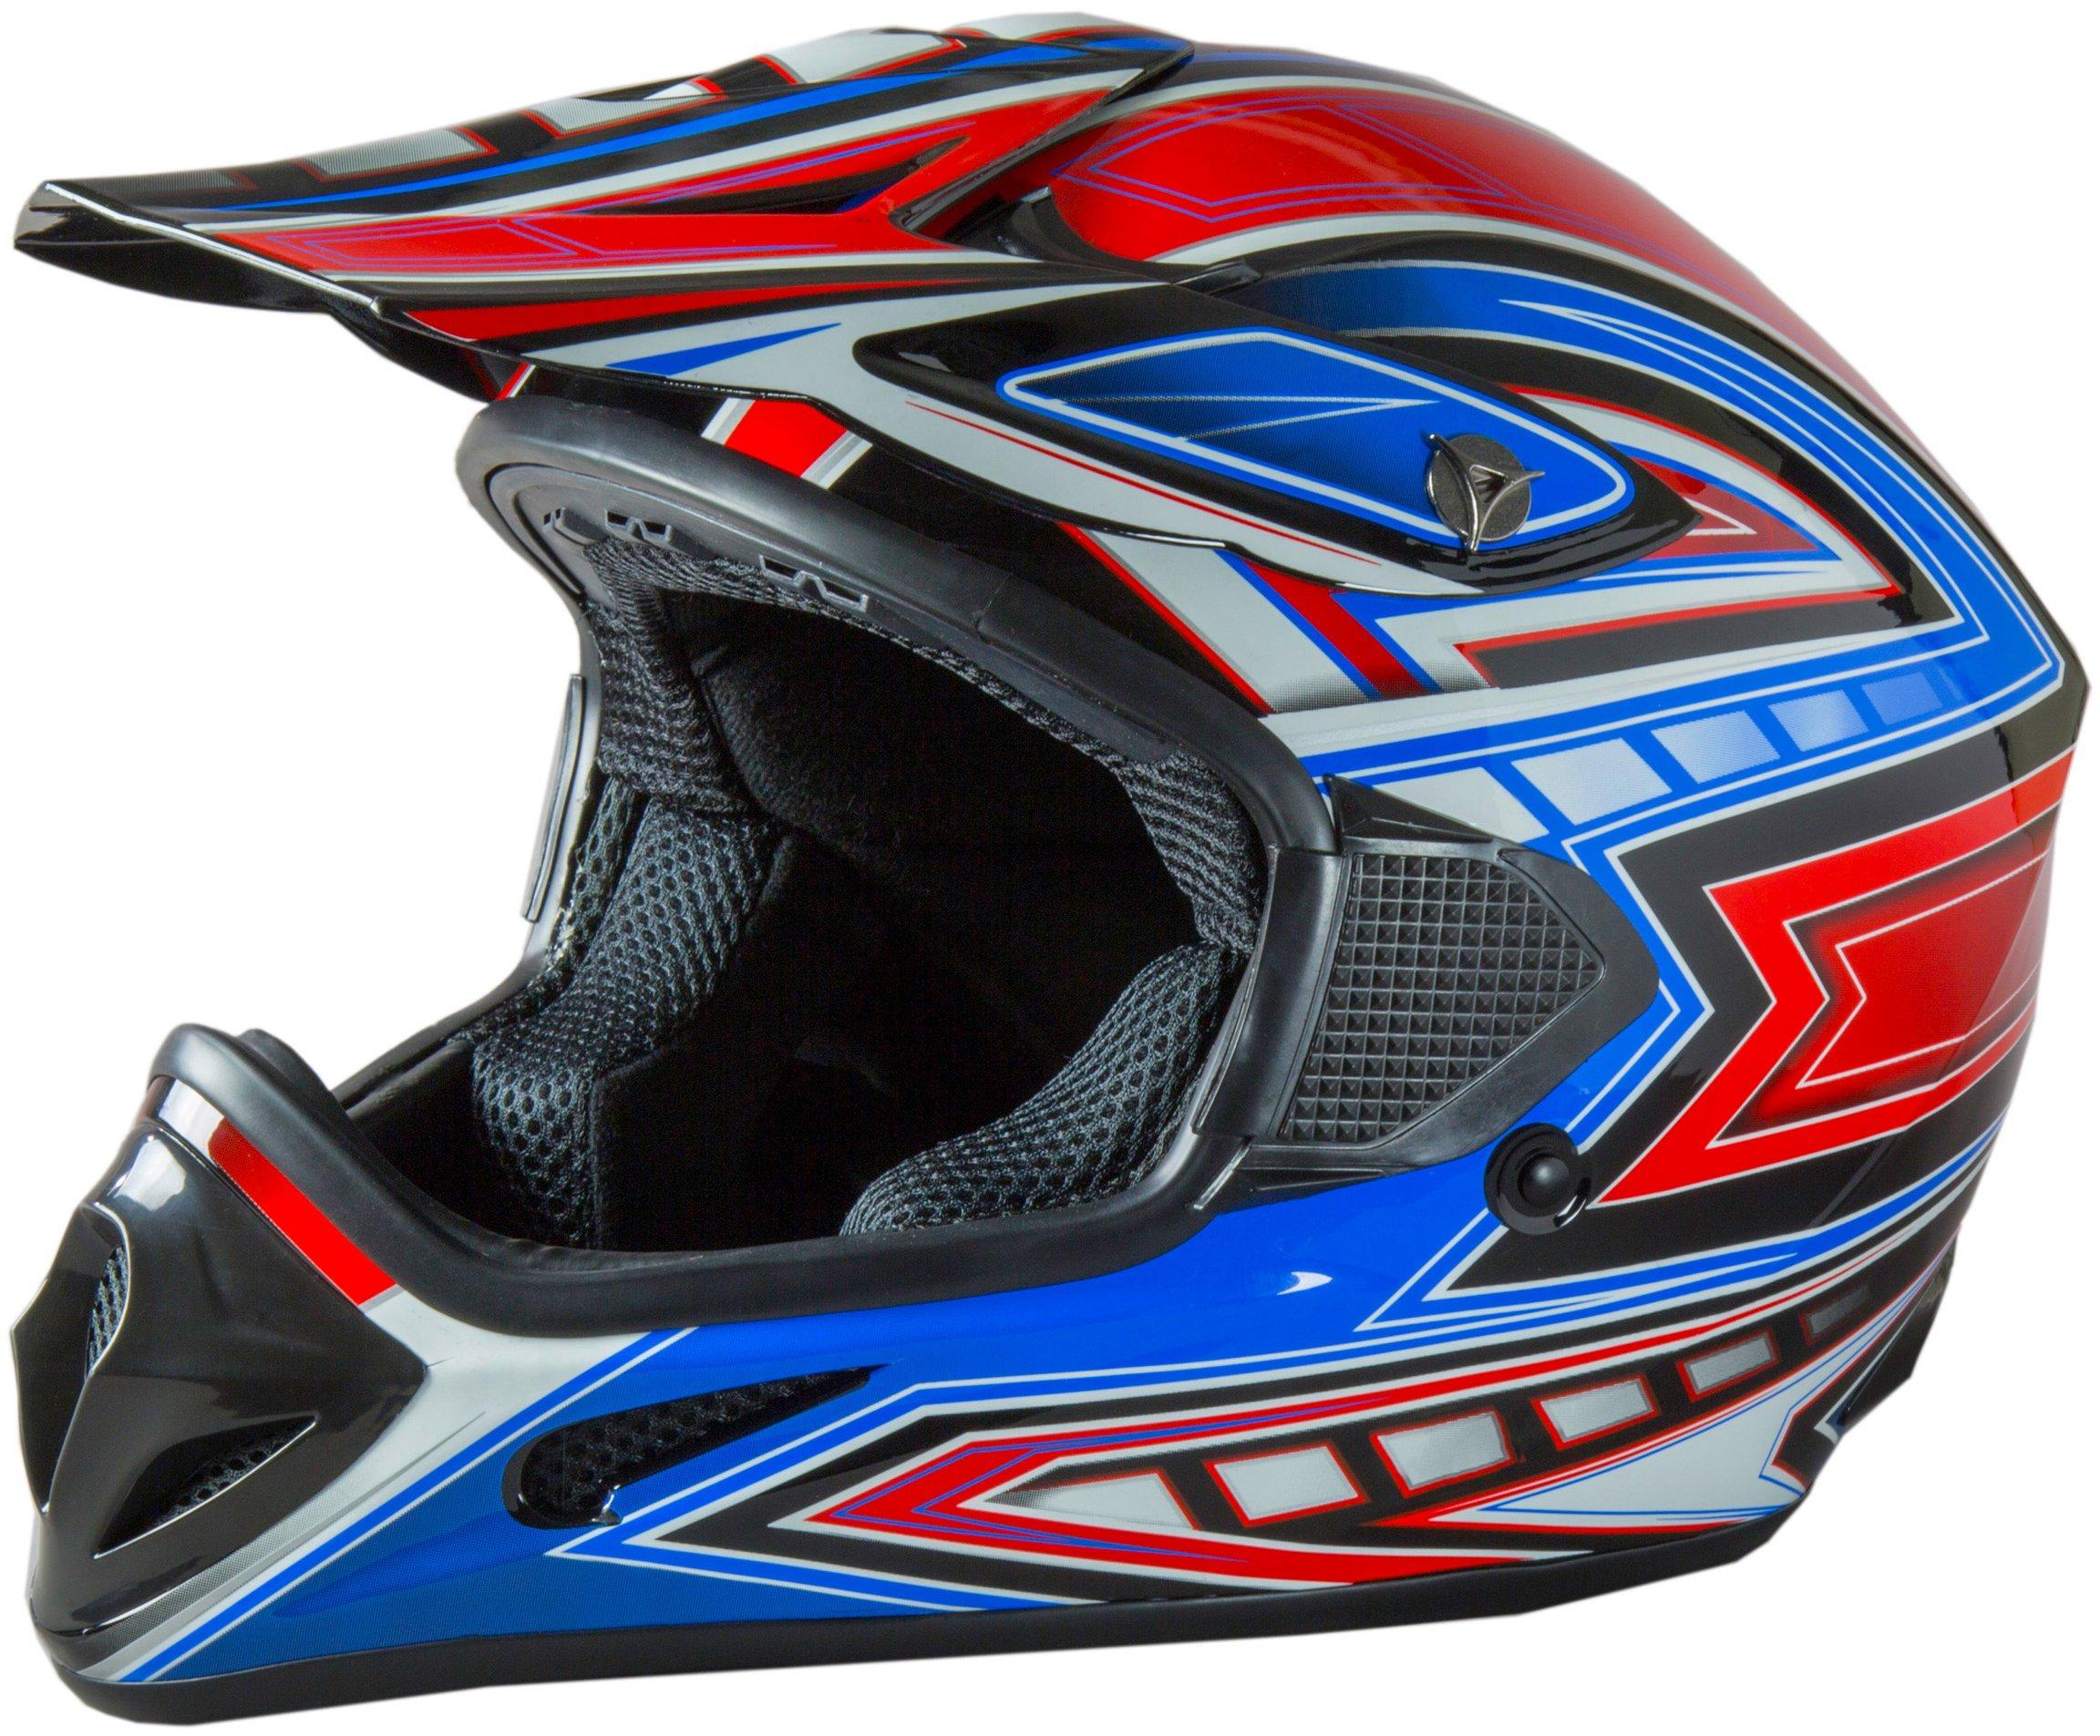 Fuel Helmets SH-OR3015 Adult Off-Road Helmet, Multicolor, Medium